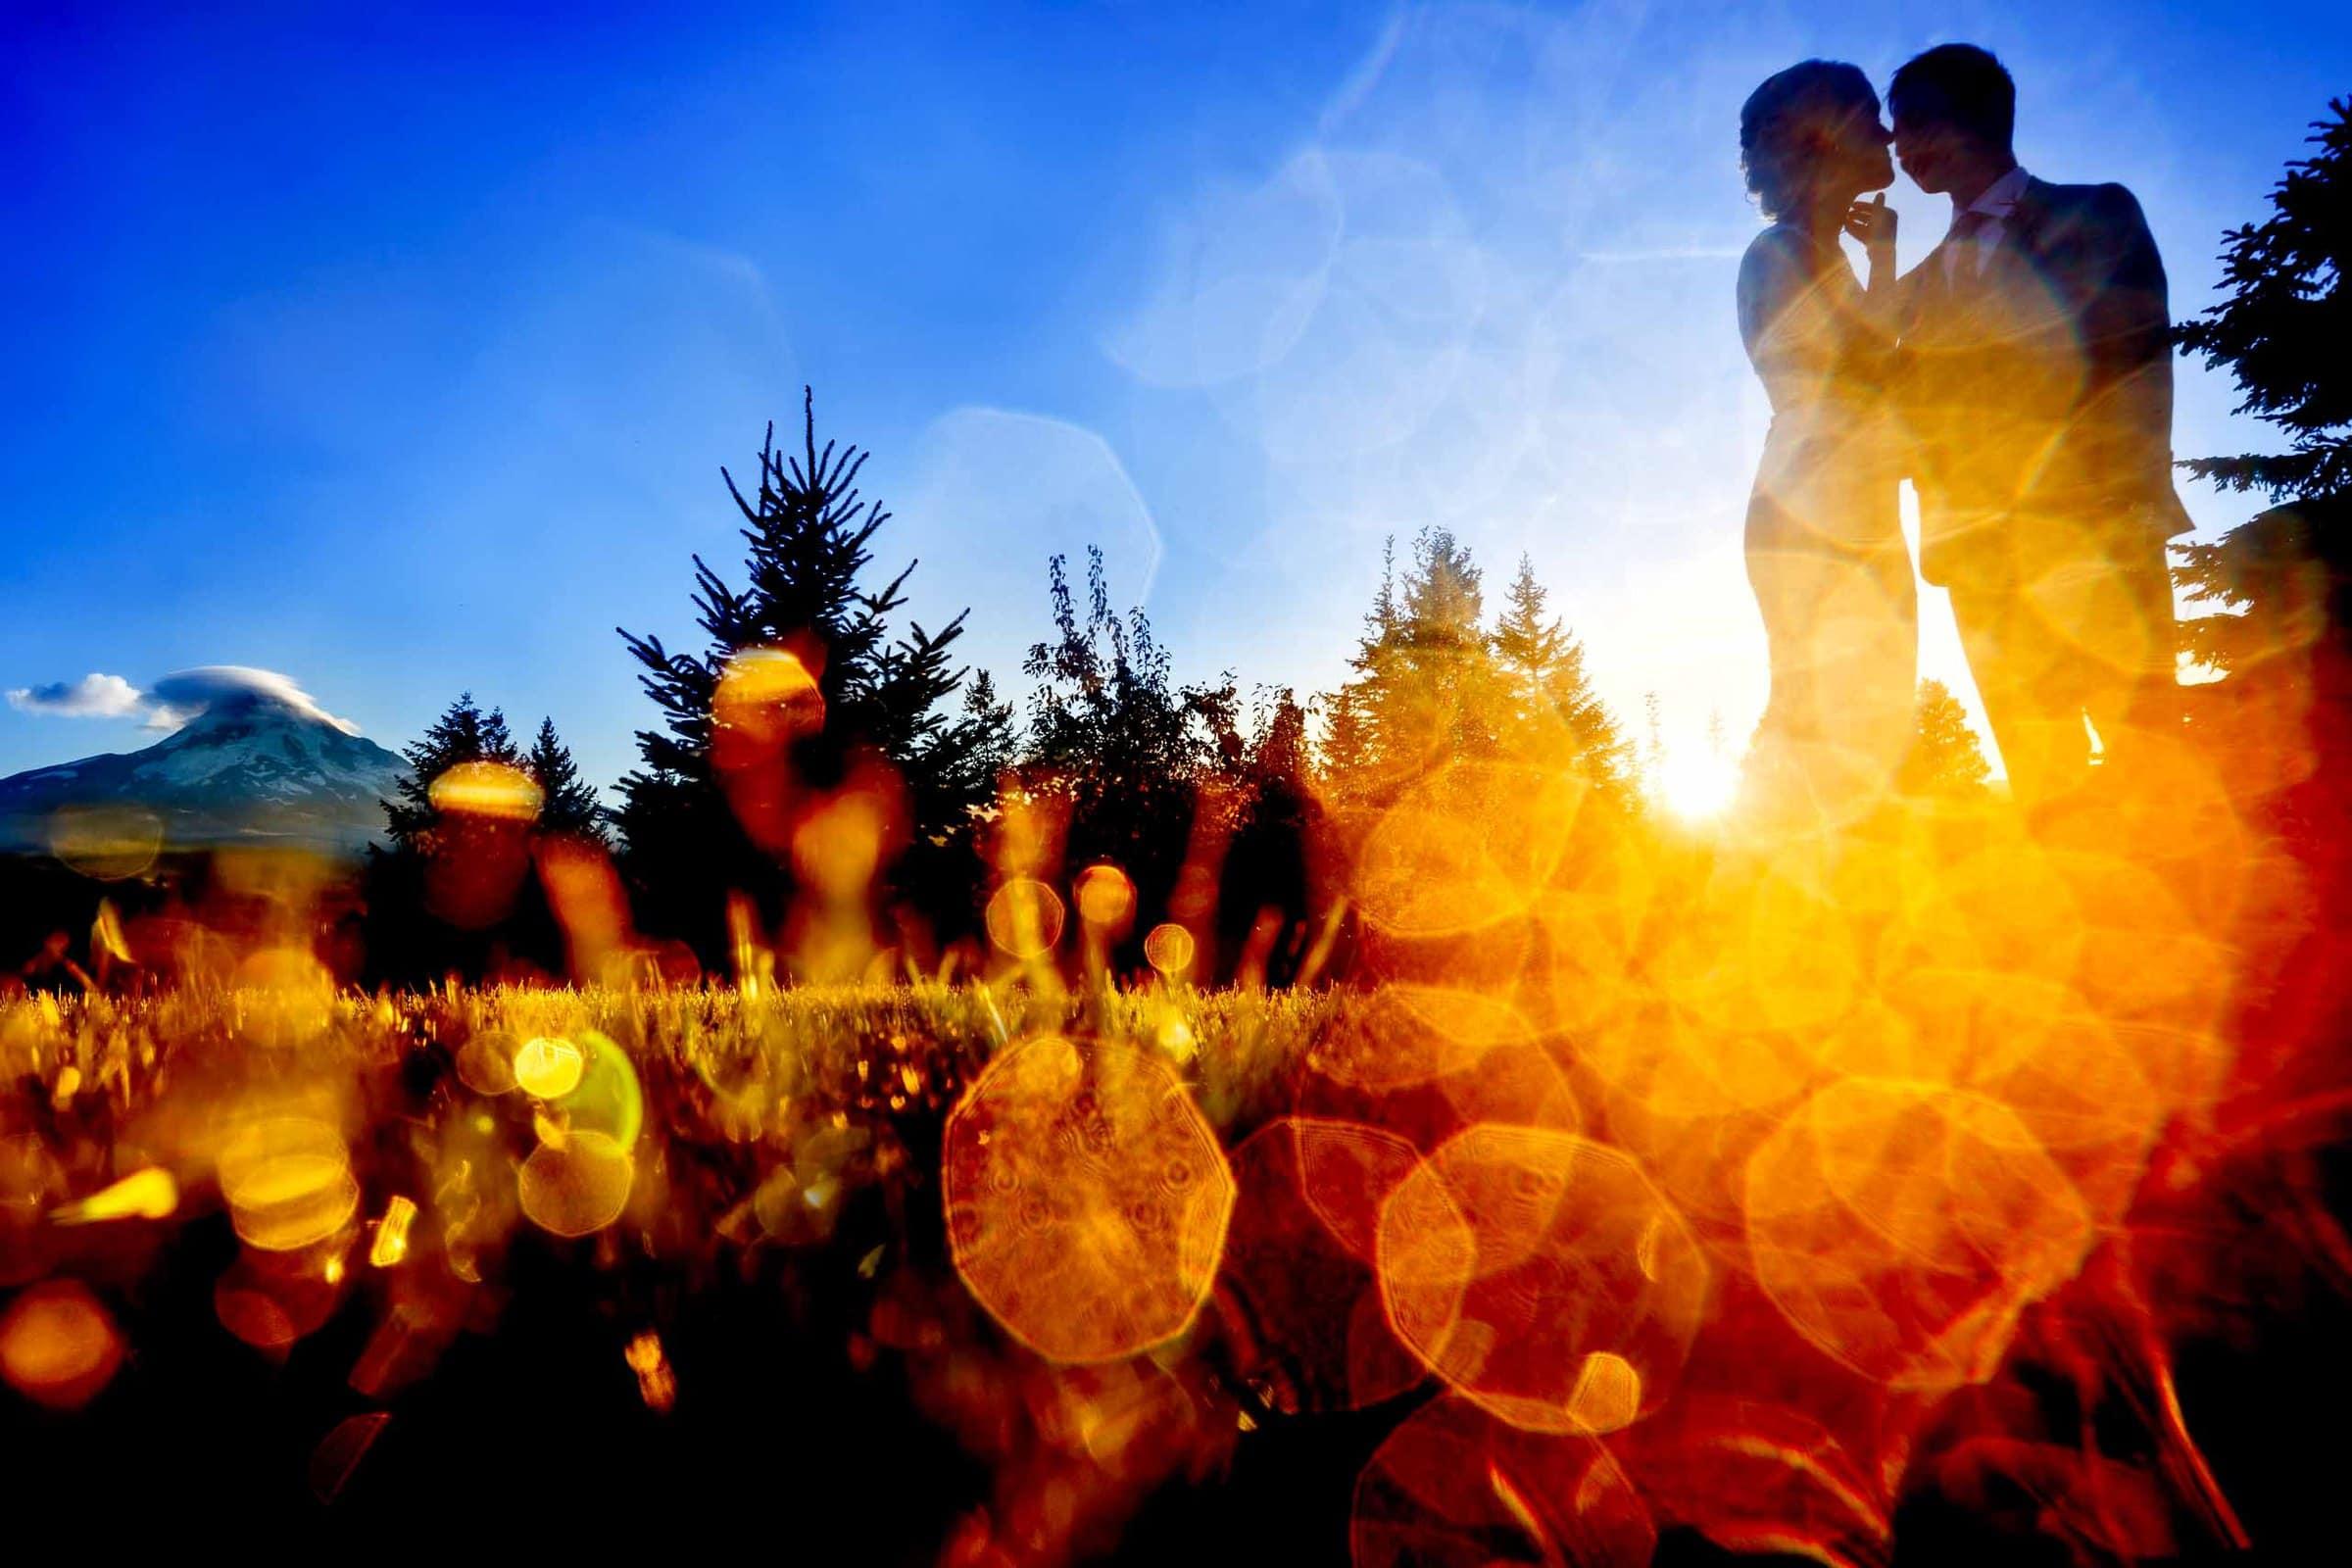 Bride and groom portrait through sun flair during a Mt Hood Organic Farms wedding reception near Hood River Oregon